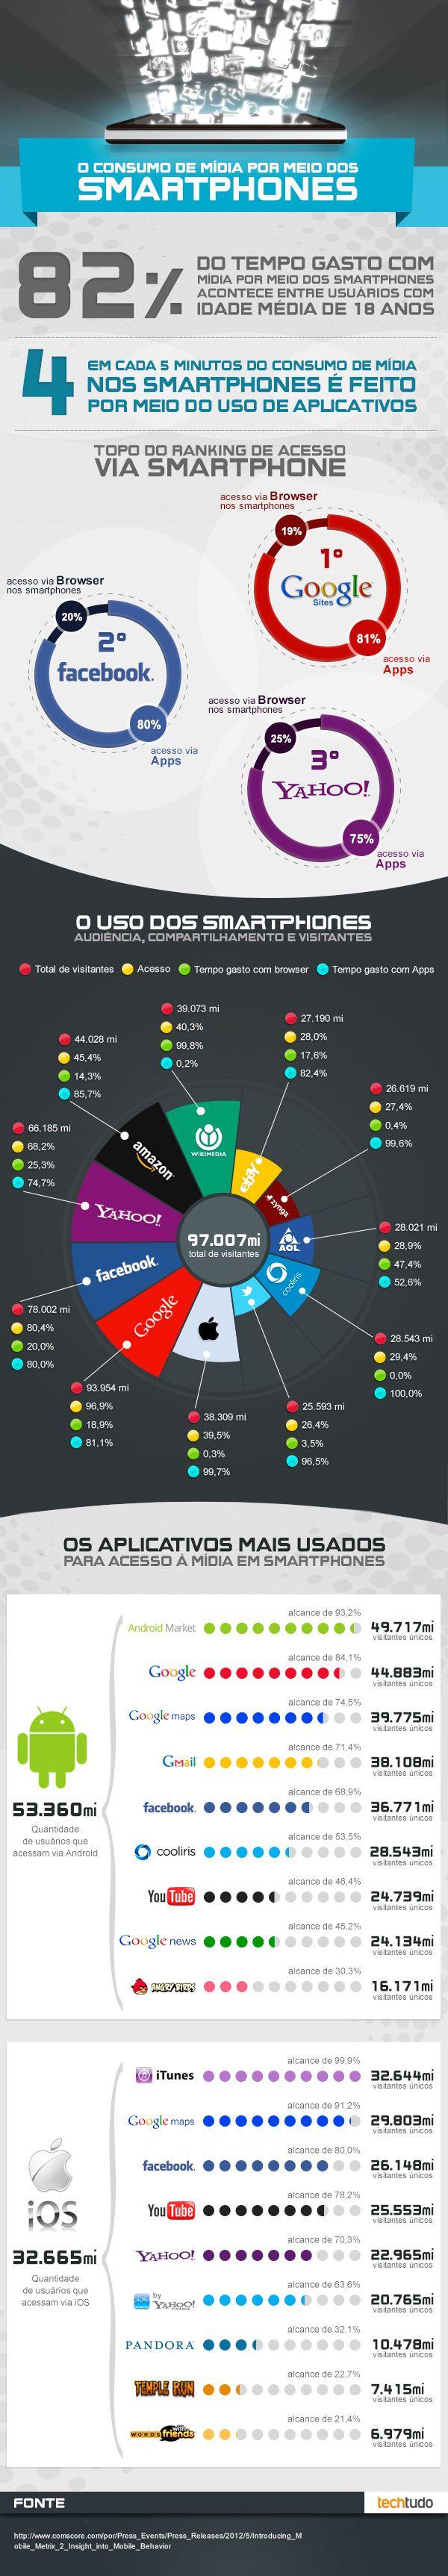 Infográfico Midia social pelo smartphone 2012